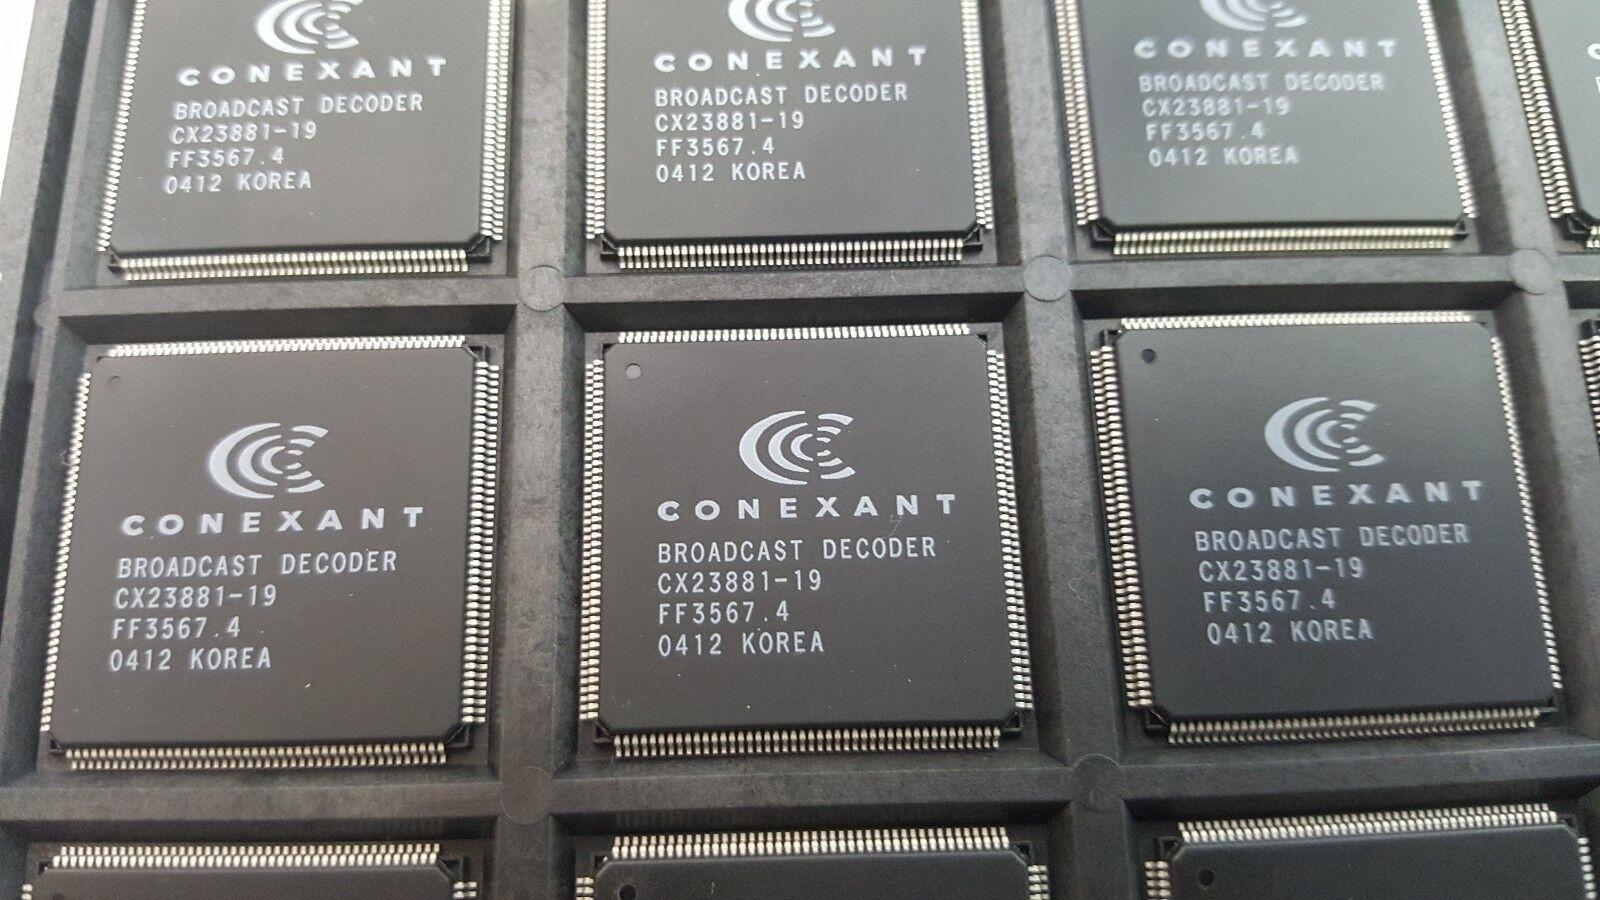 CONEXANT BROADCAST DECODER CX23881 TREIBER